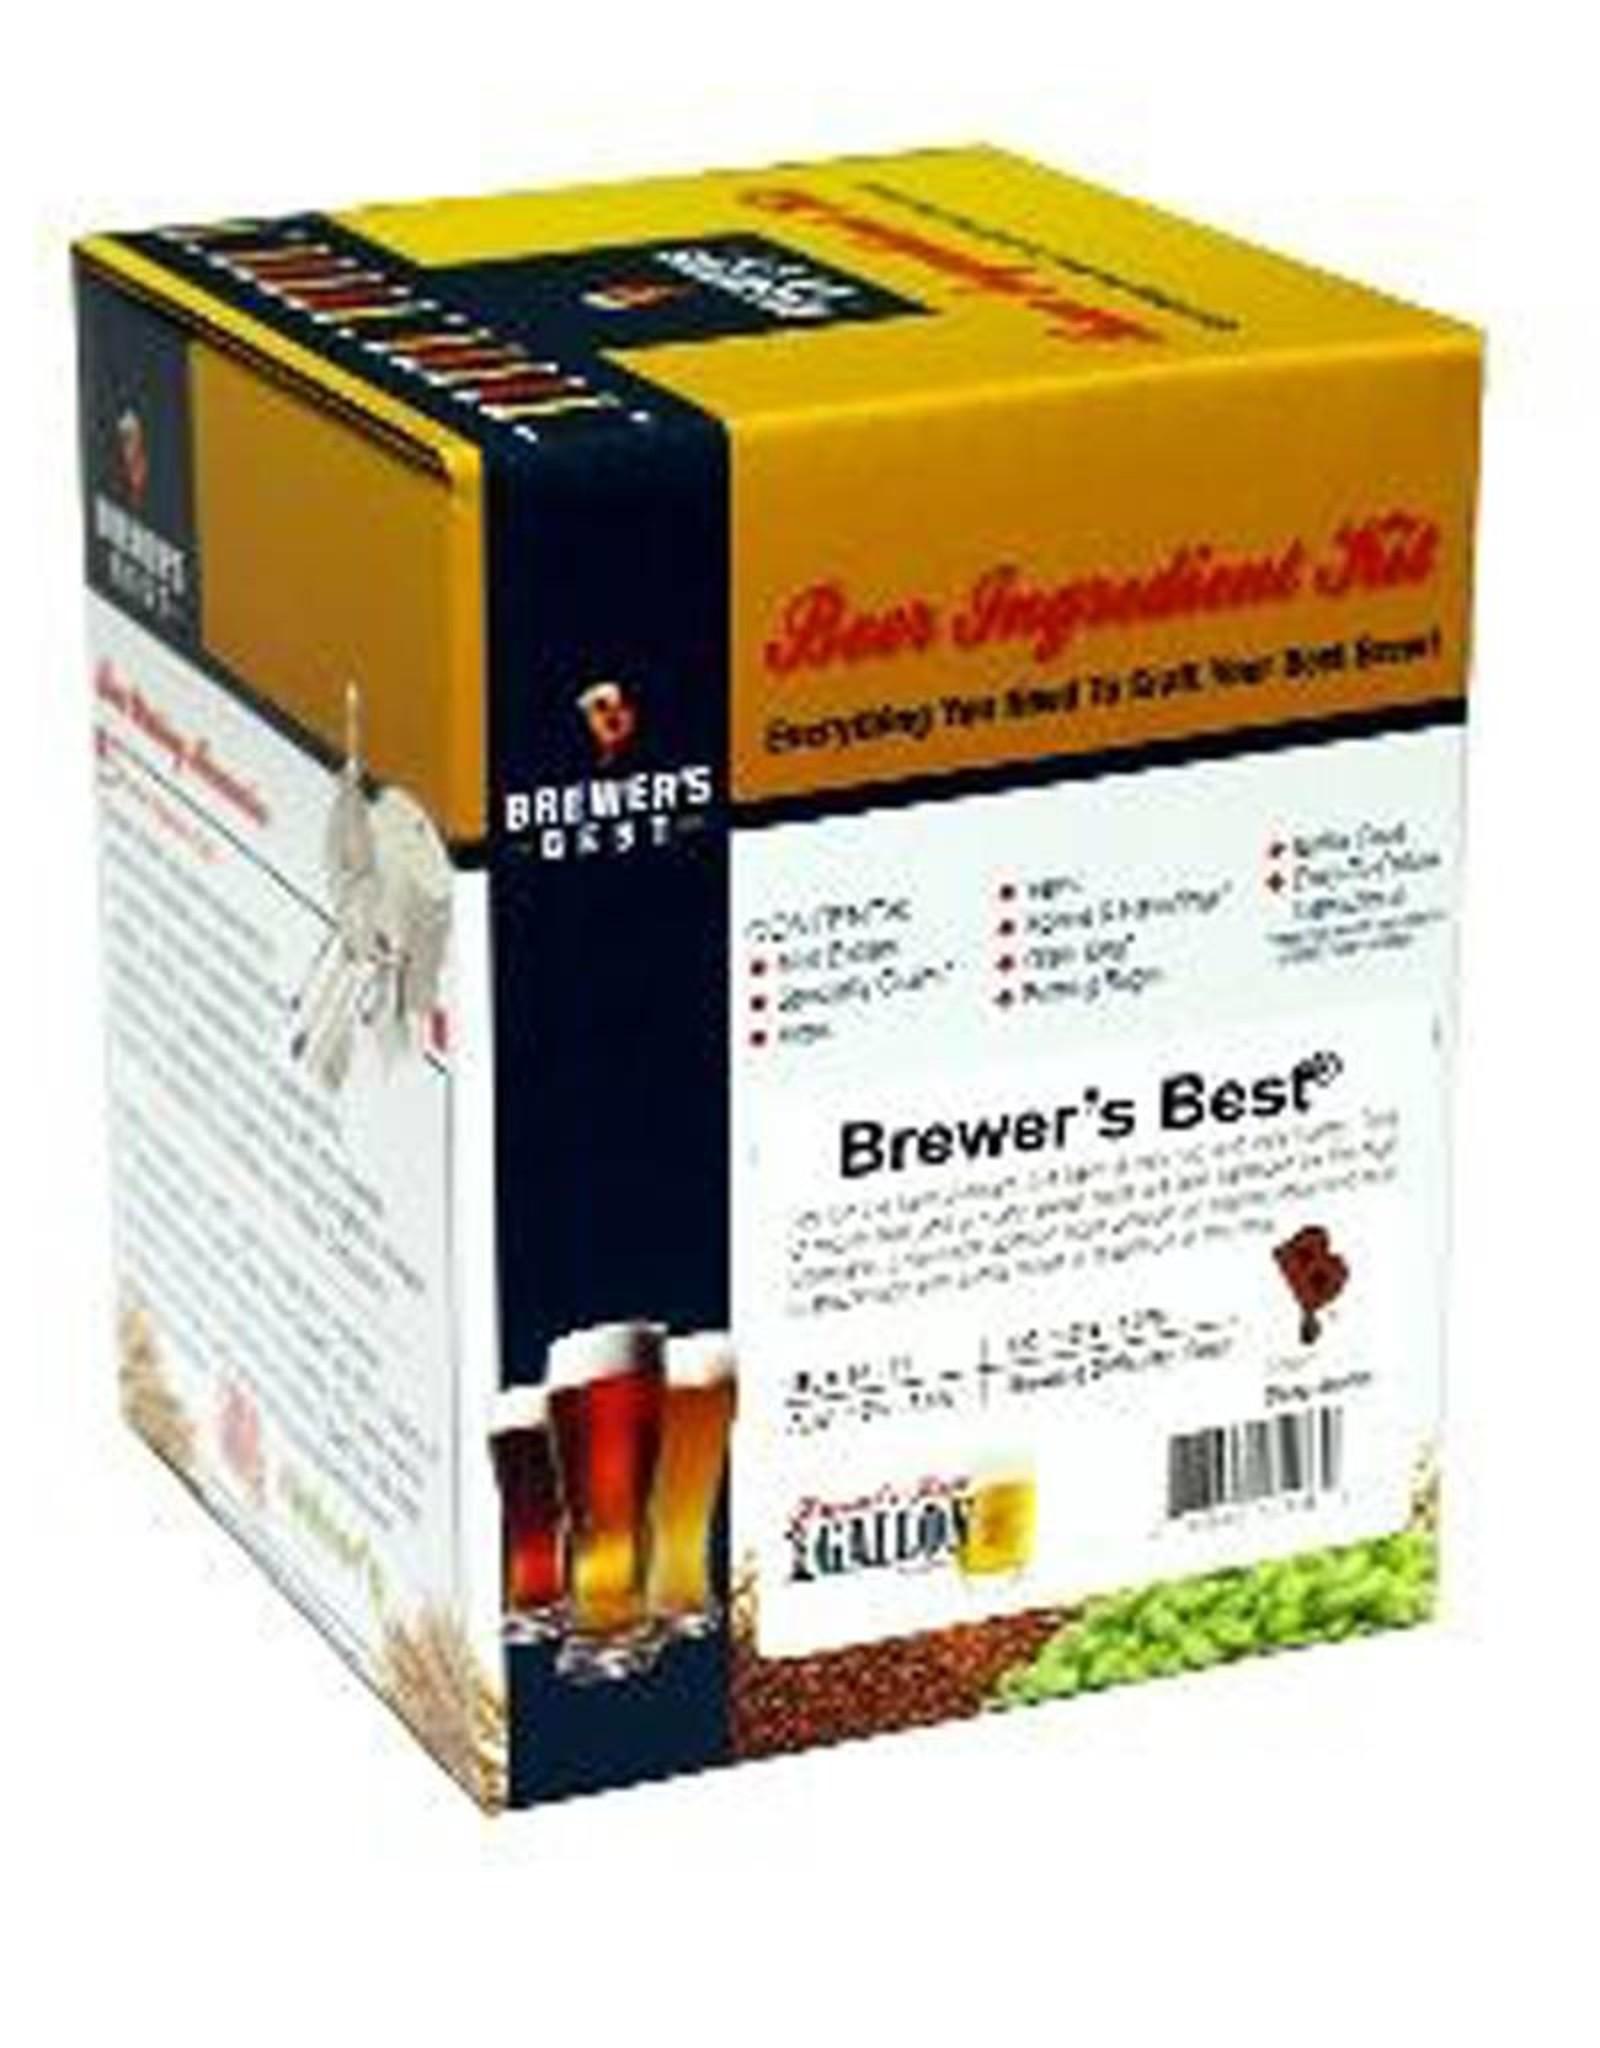 Brewers Best Grapefruit IPA gal ingredient kit